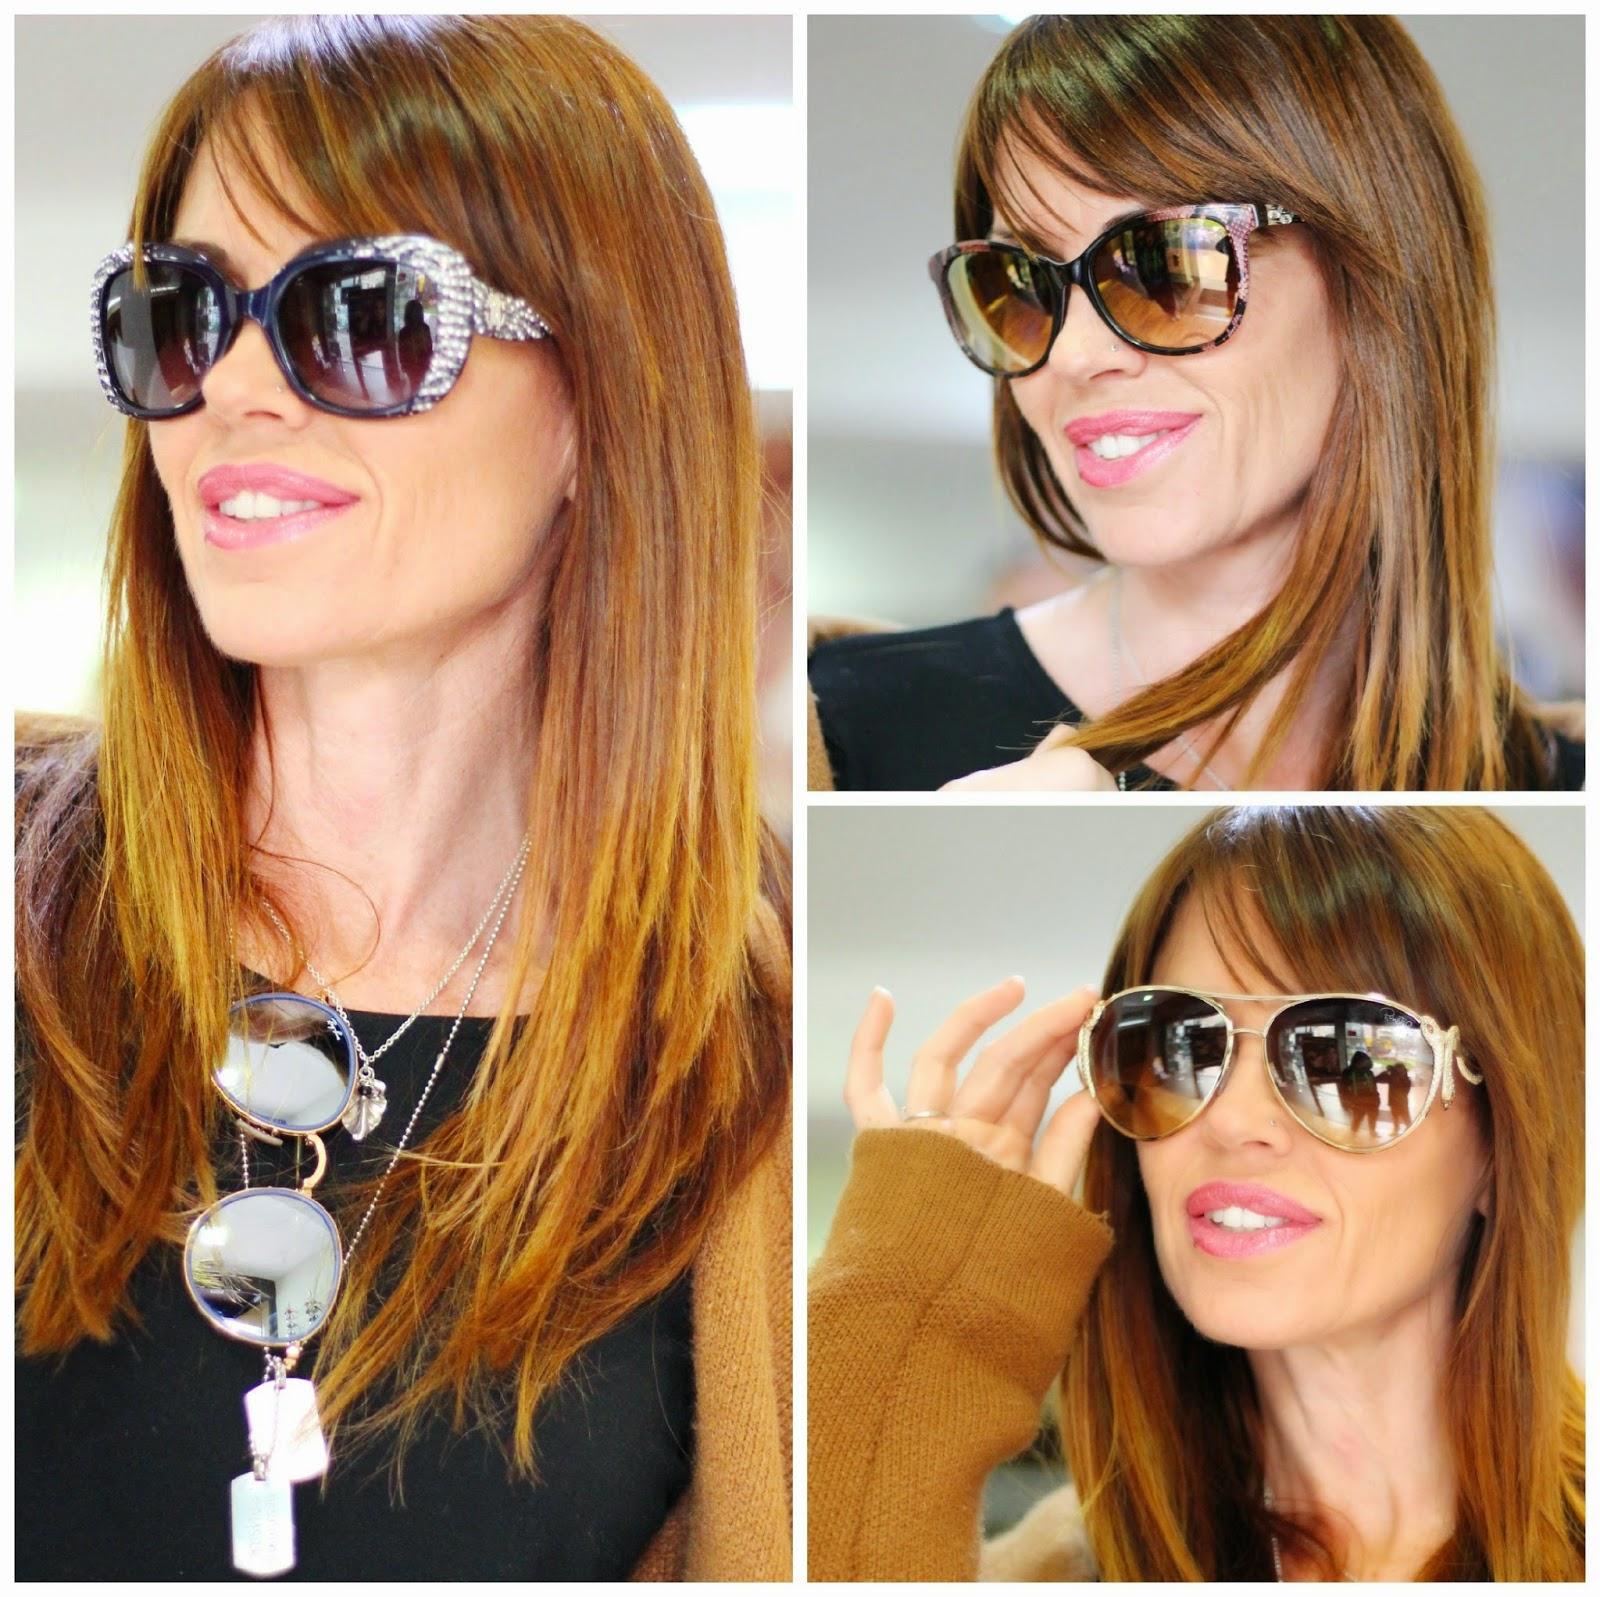 Tendencias gafas de sol 2015 - Cavalli - Tom Ford - Dsquared - Fashion Blogger - Sunnies